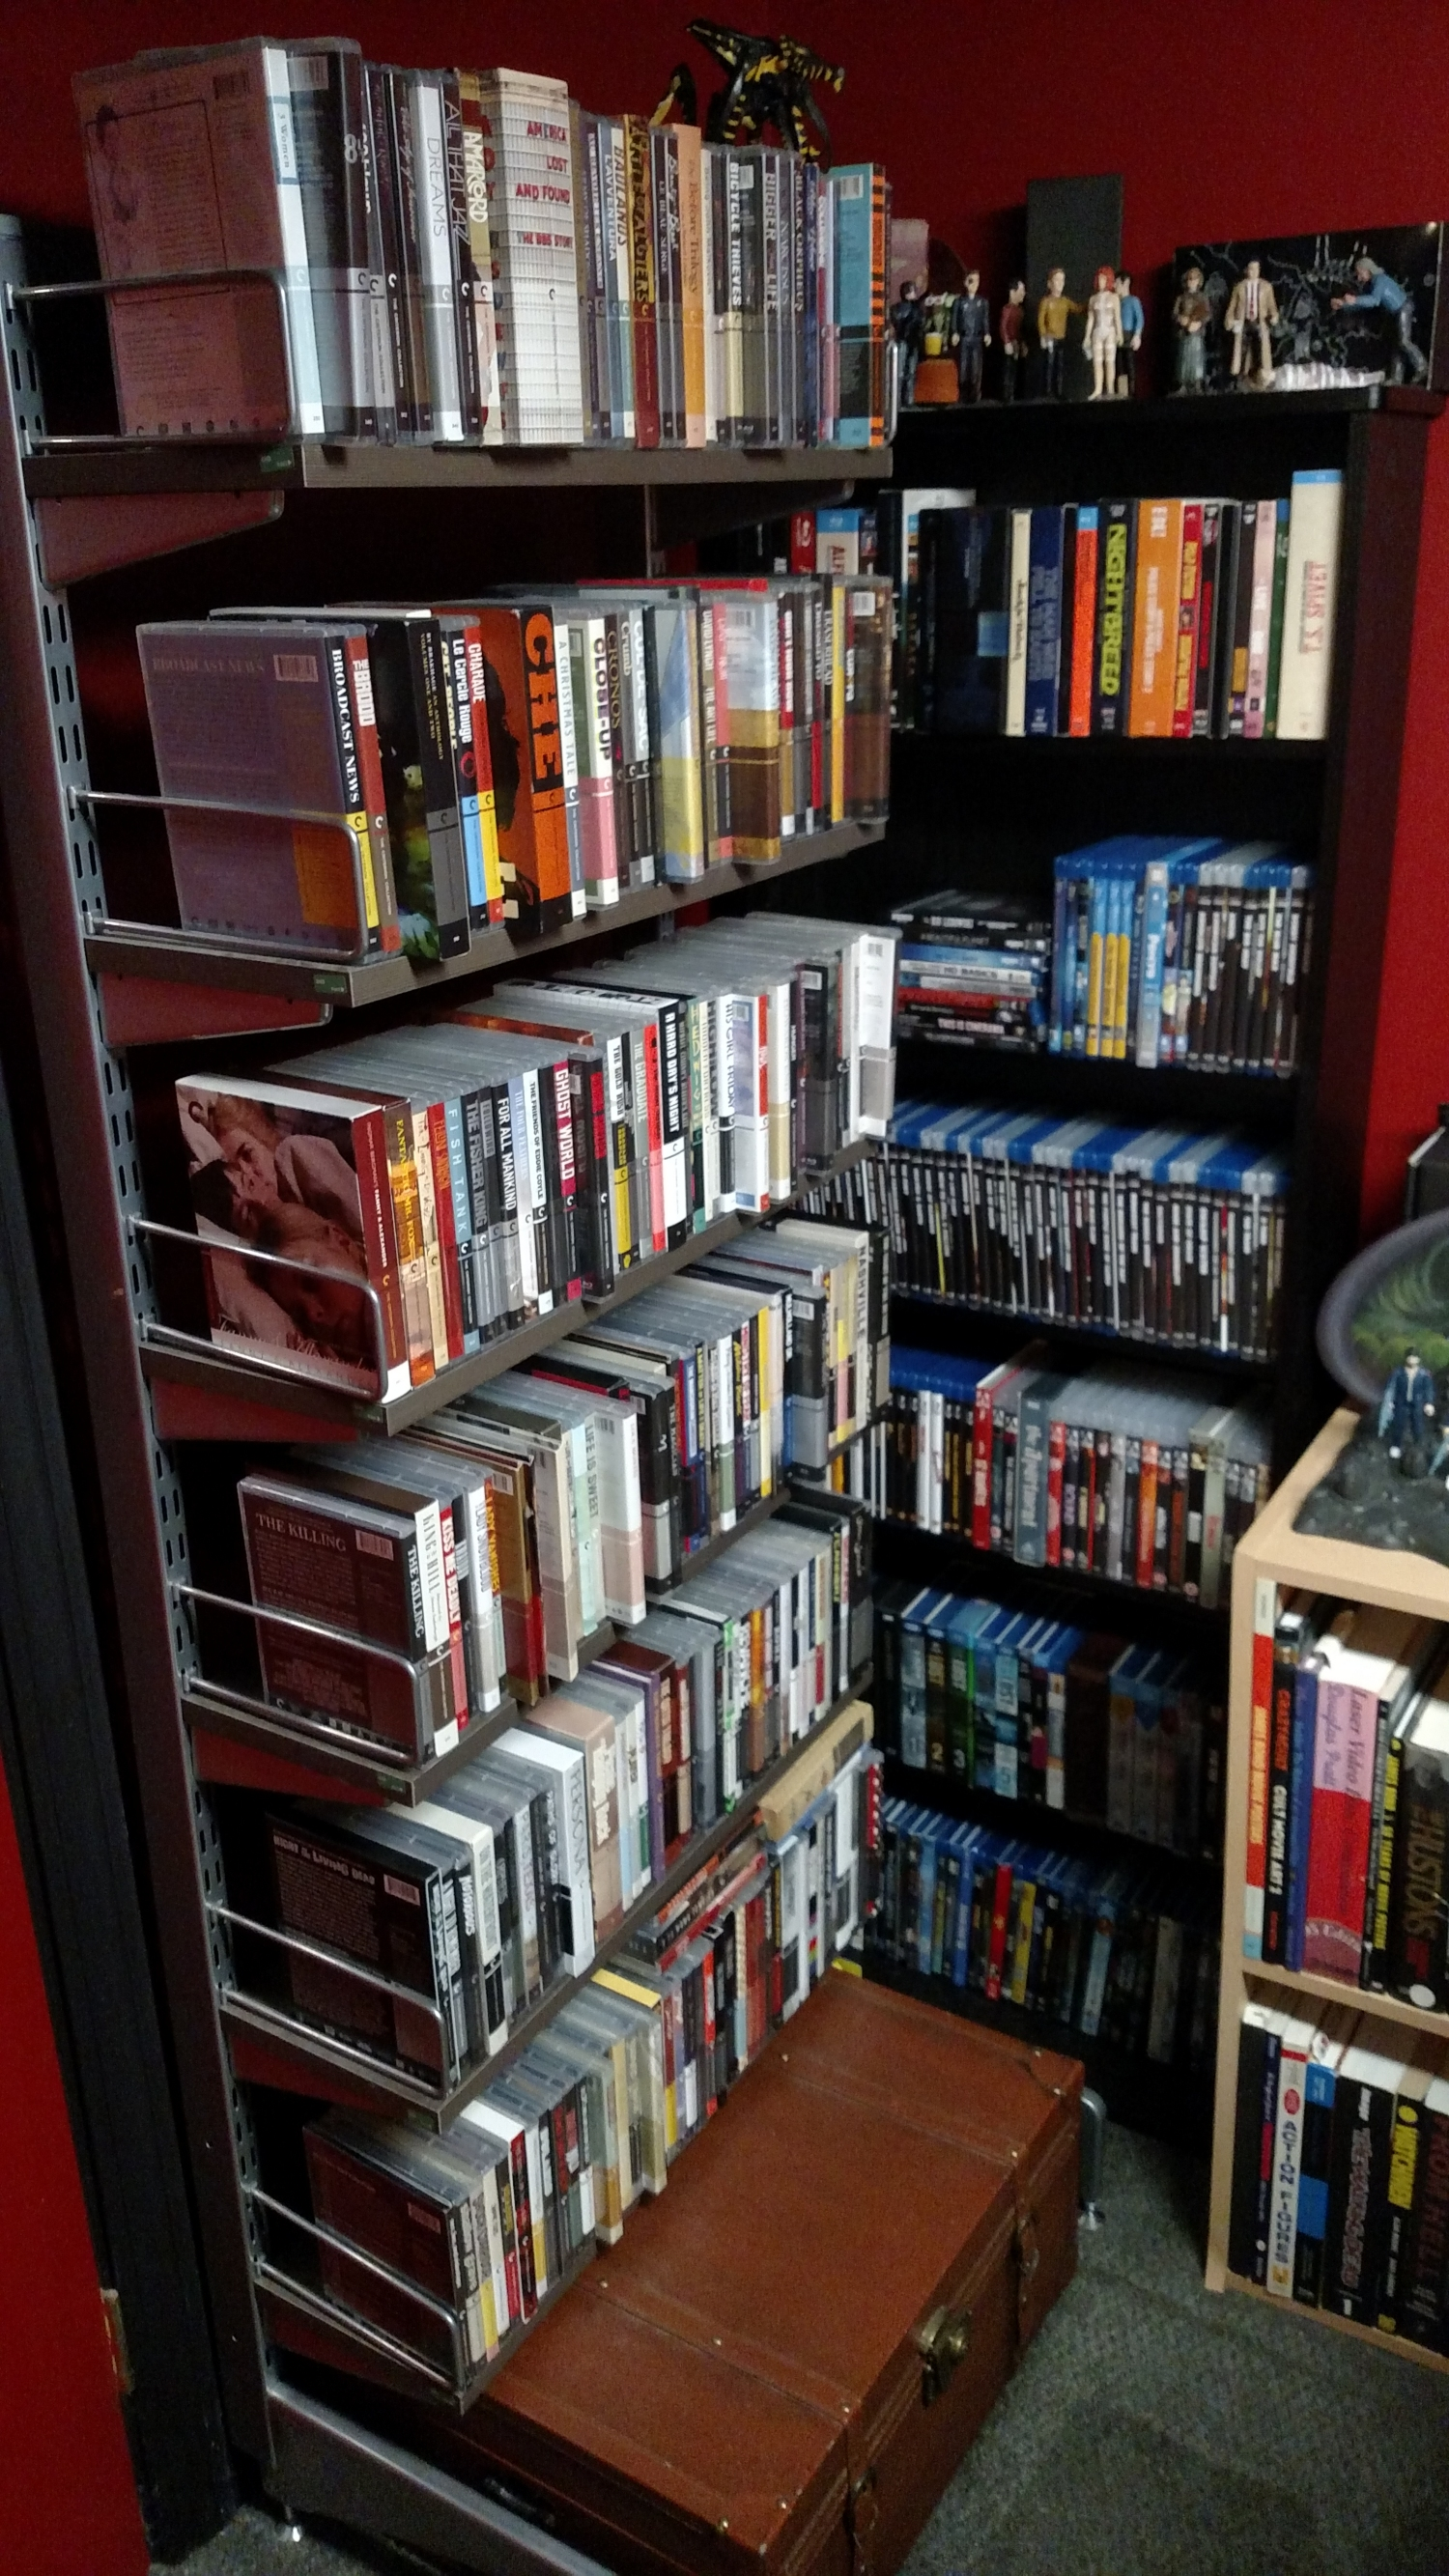 Criterion Blu-ray Shelf